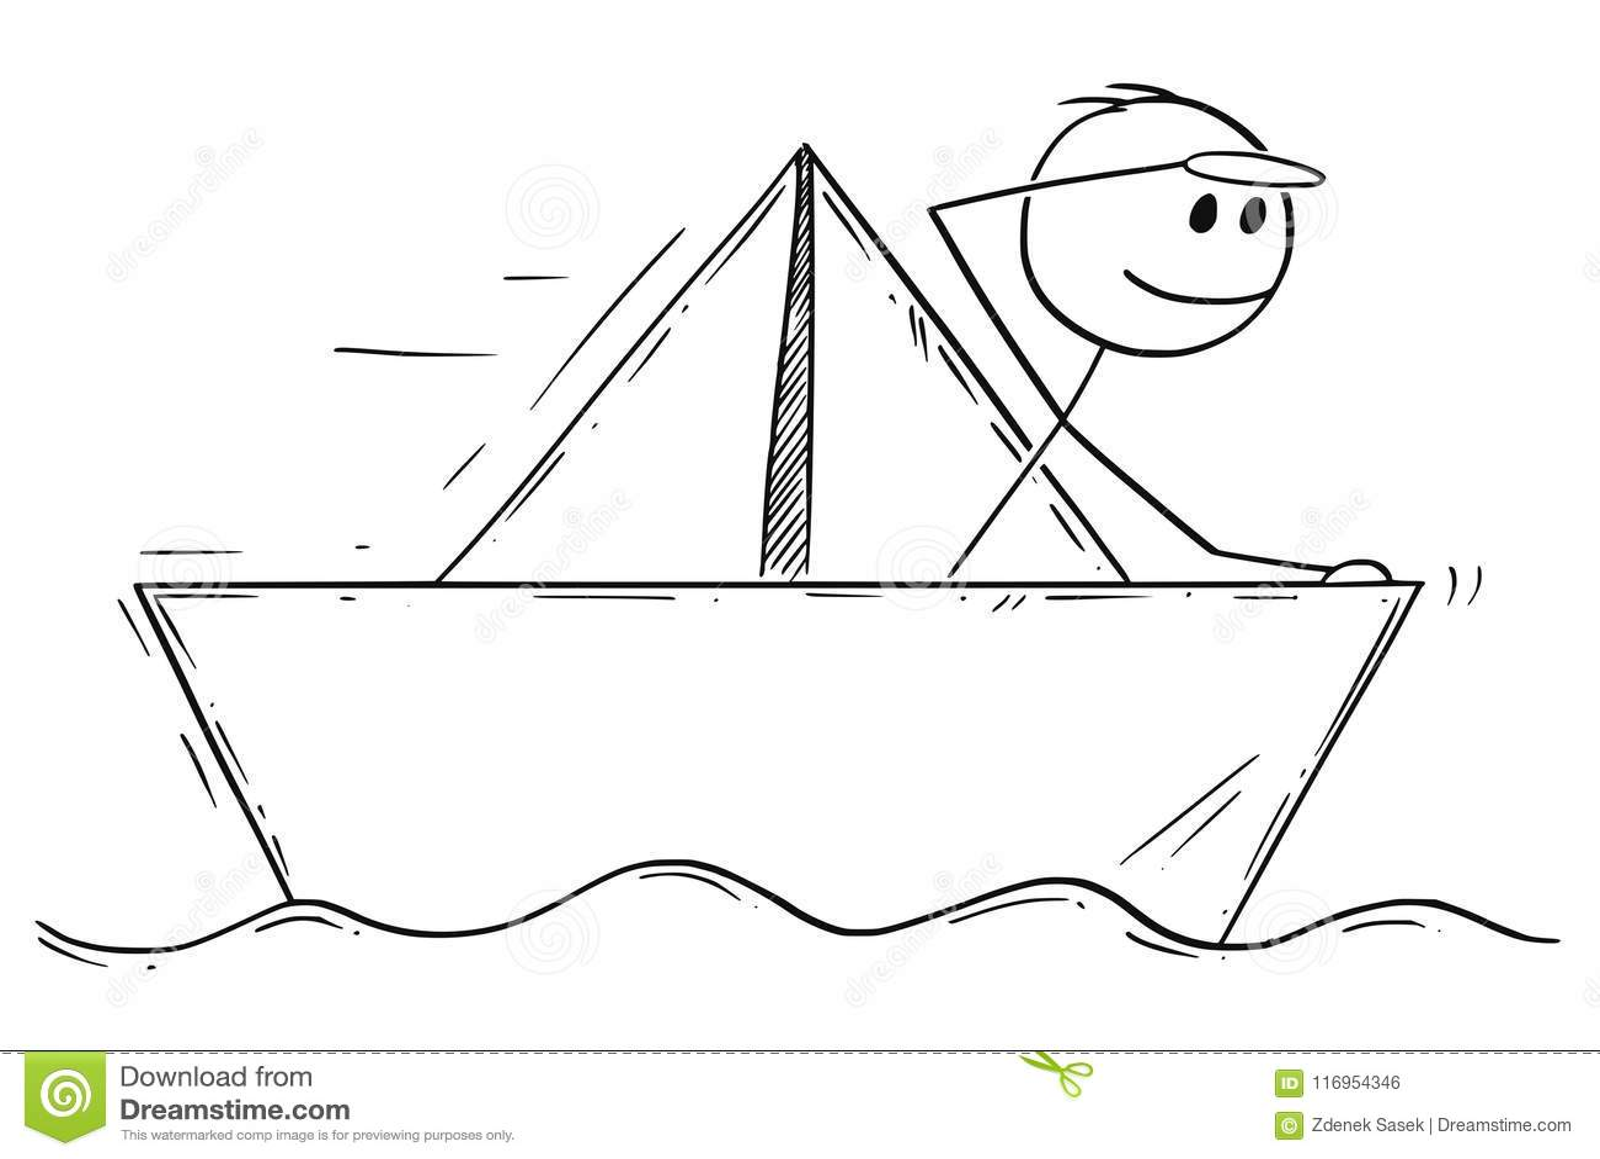 Cartoon Of Businessman Sailing Paper Ship Or Boat Stock